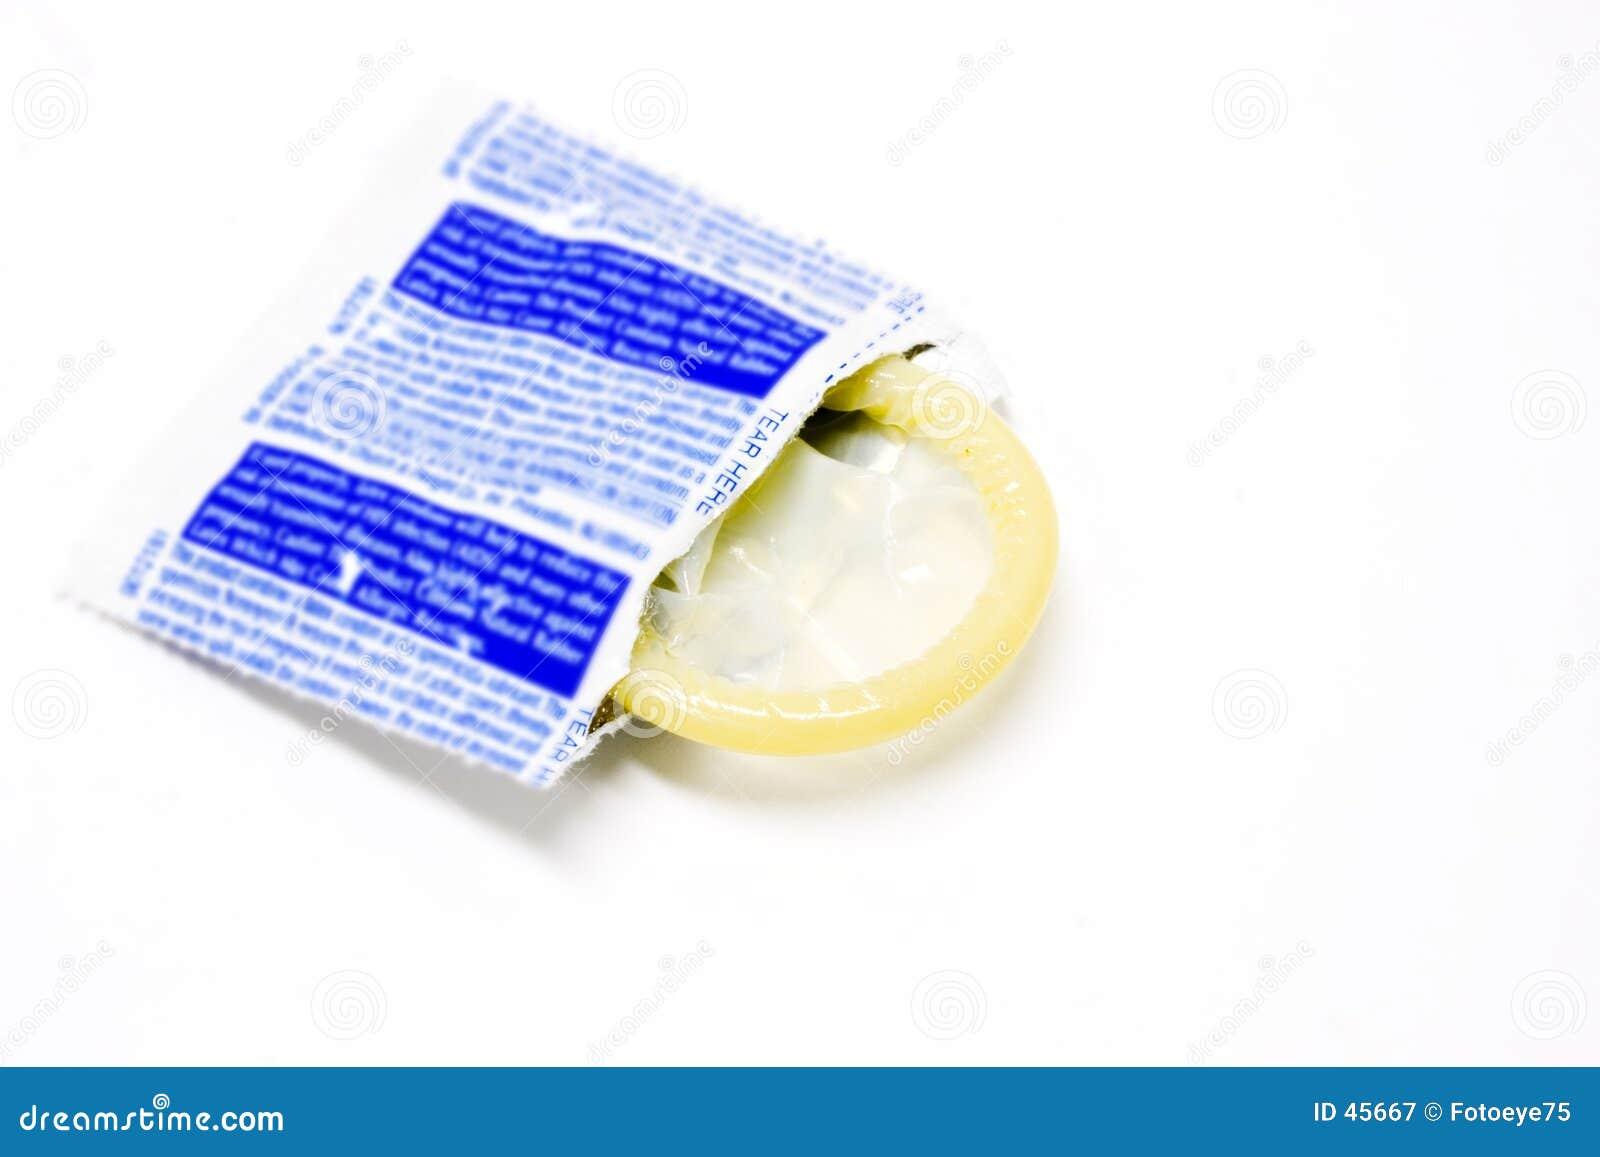 Condom Safe Sex